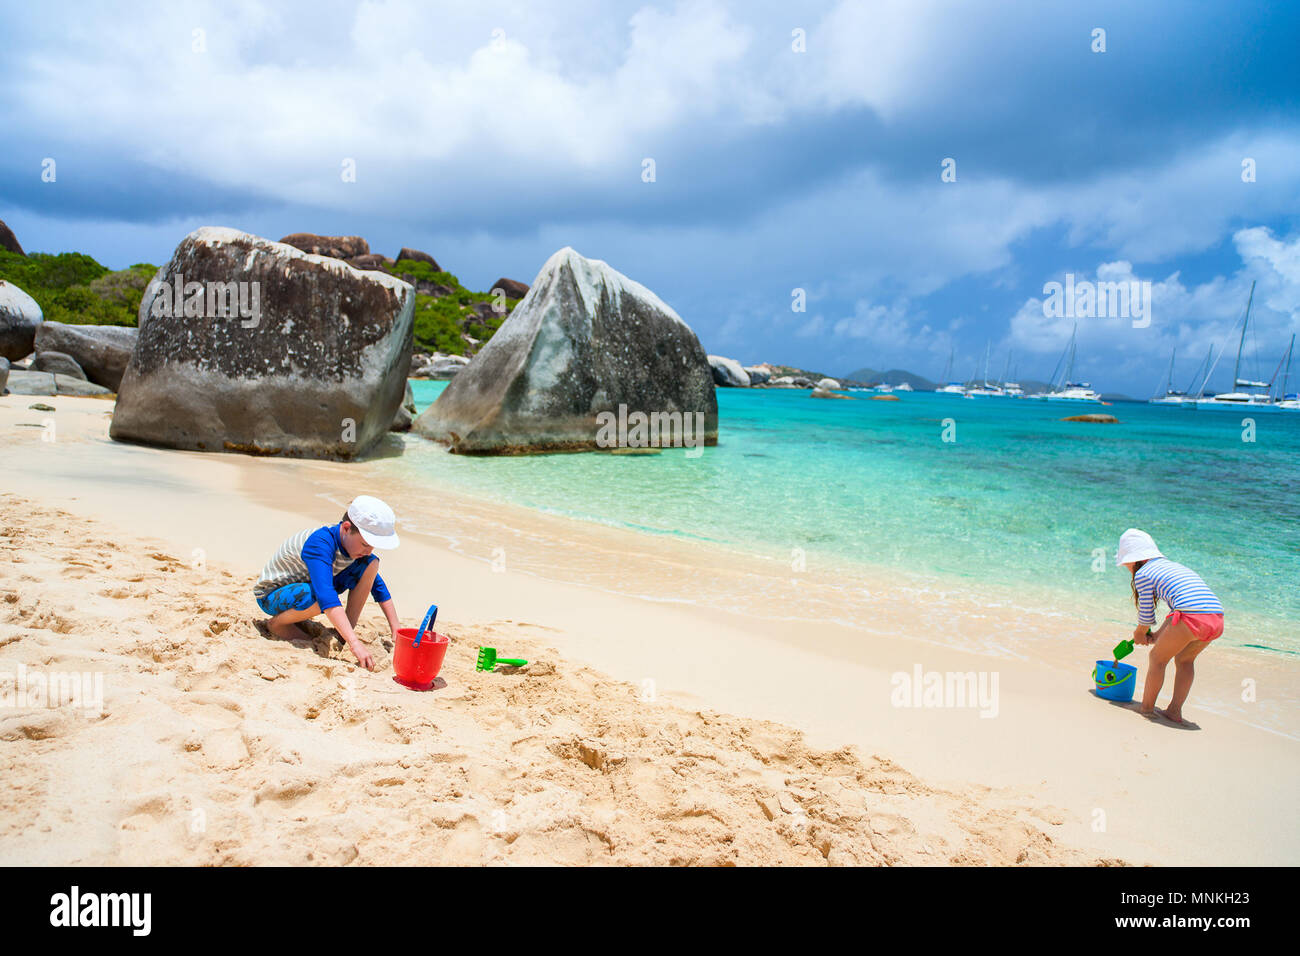 Kids wearing sun protection rash guard playing at beach during summer vacation - Stock Image